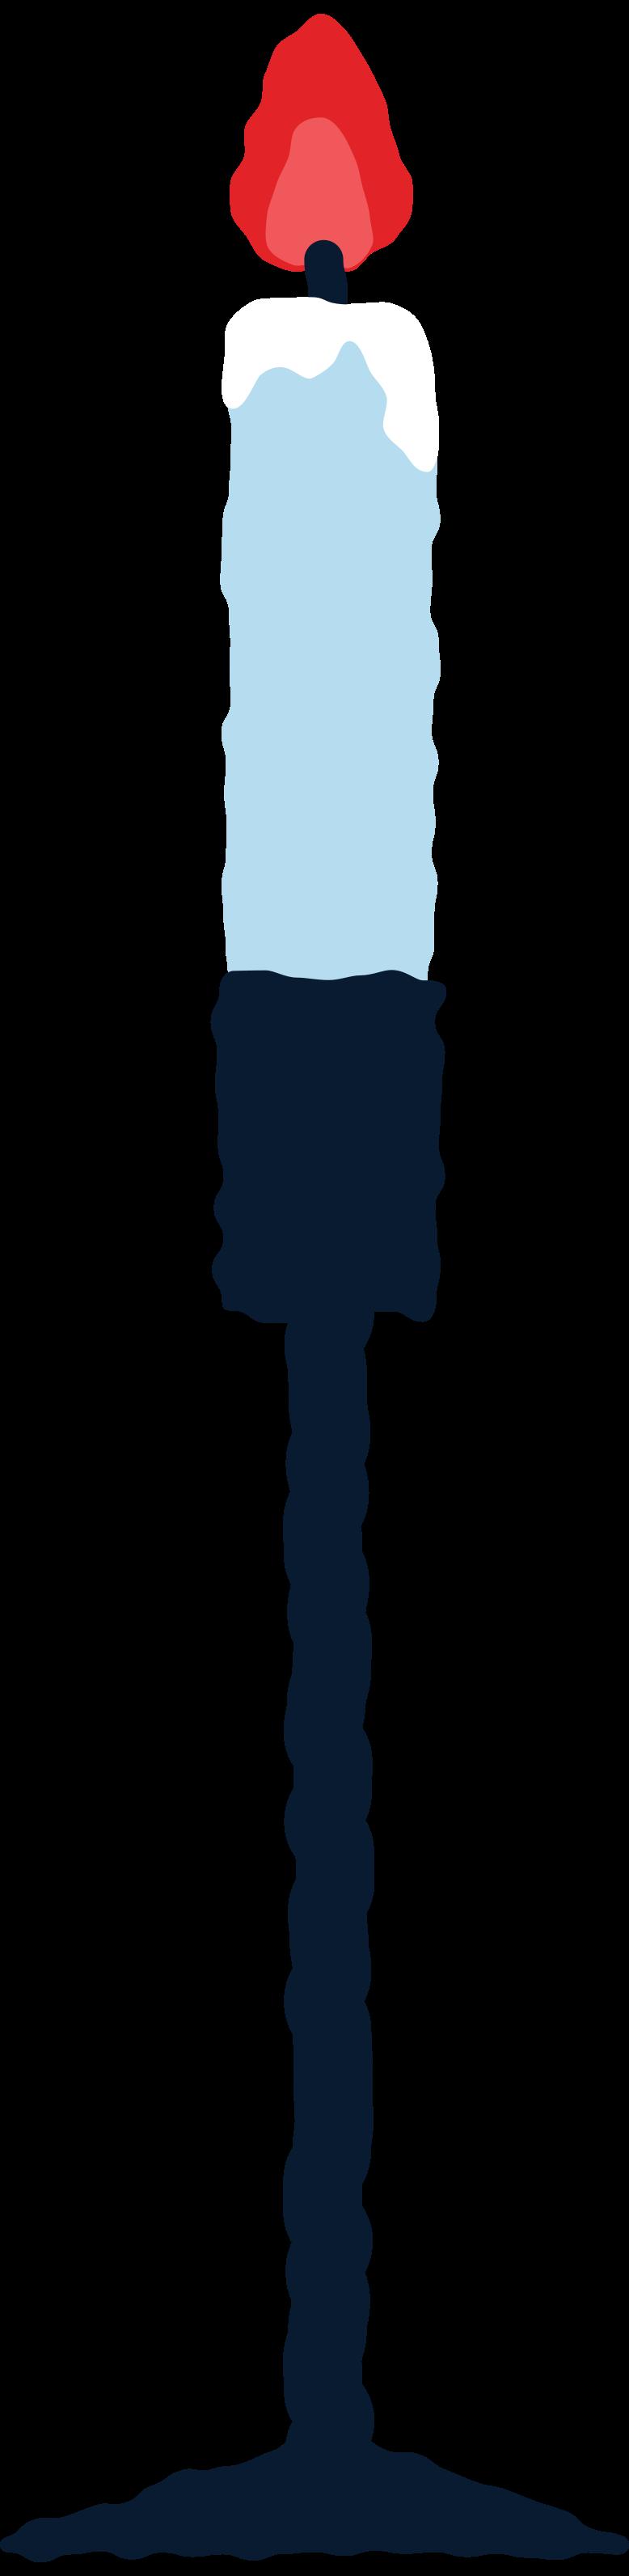 candle in chandelier short Clipart illustration in PNG, SVG